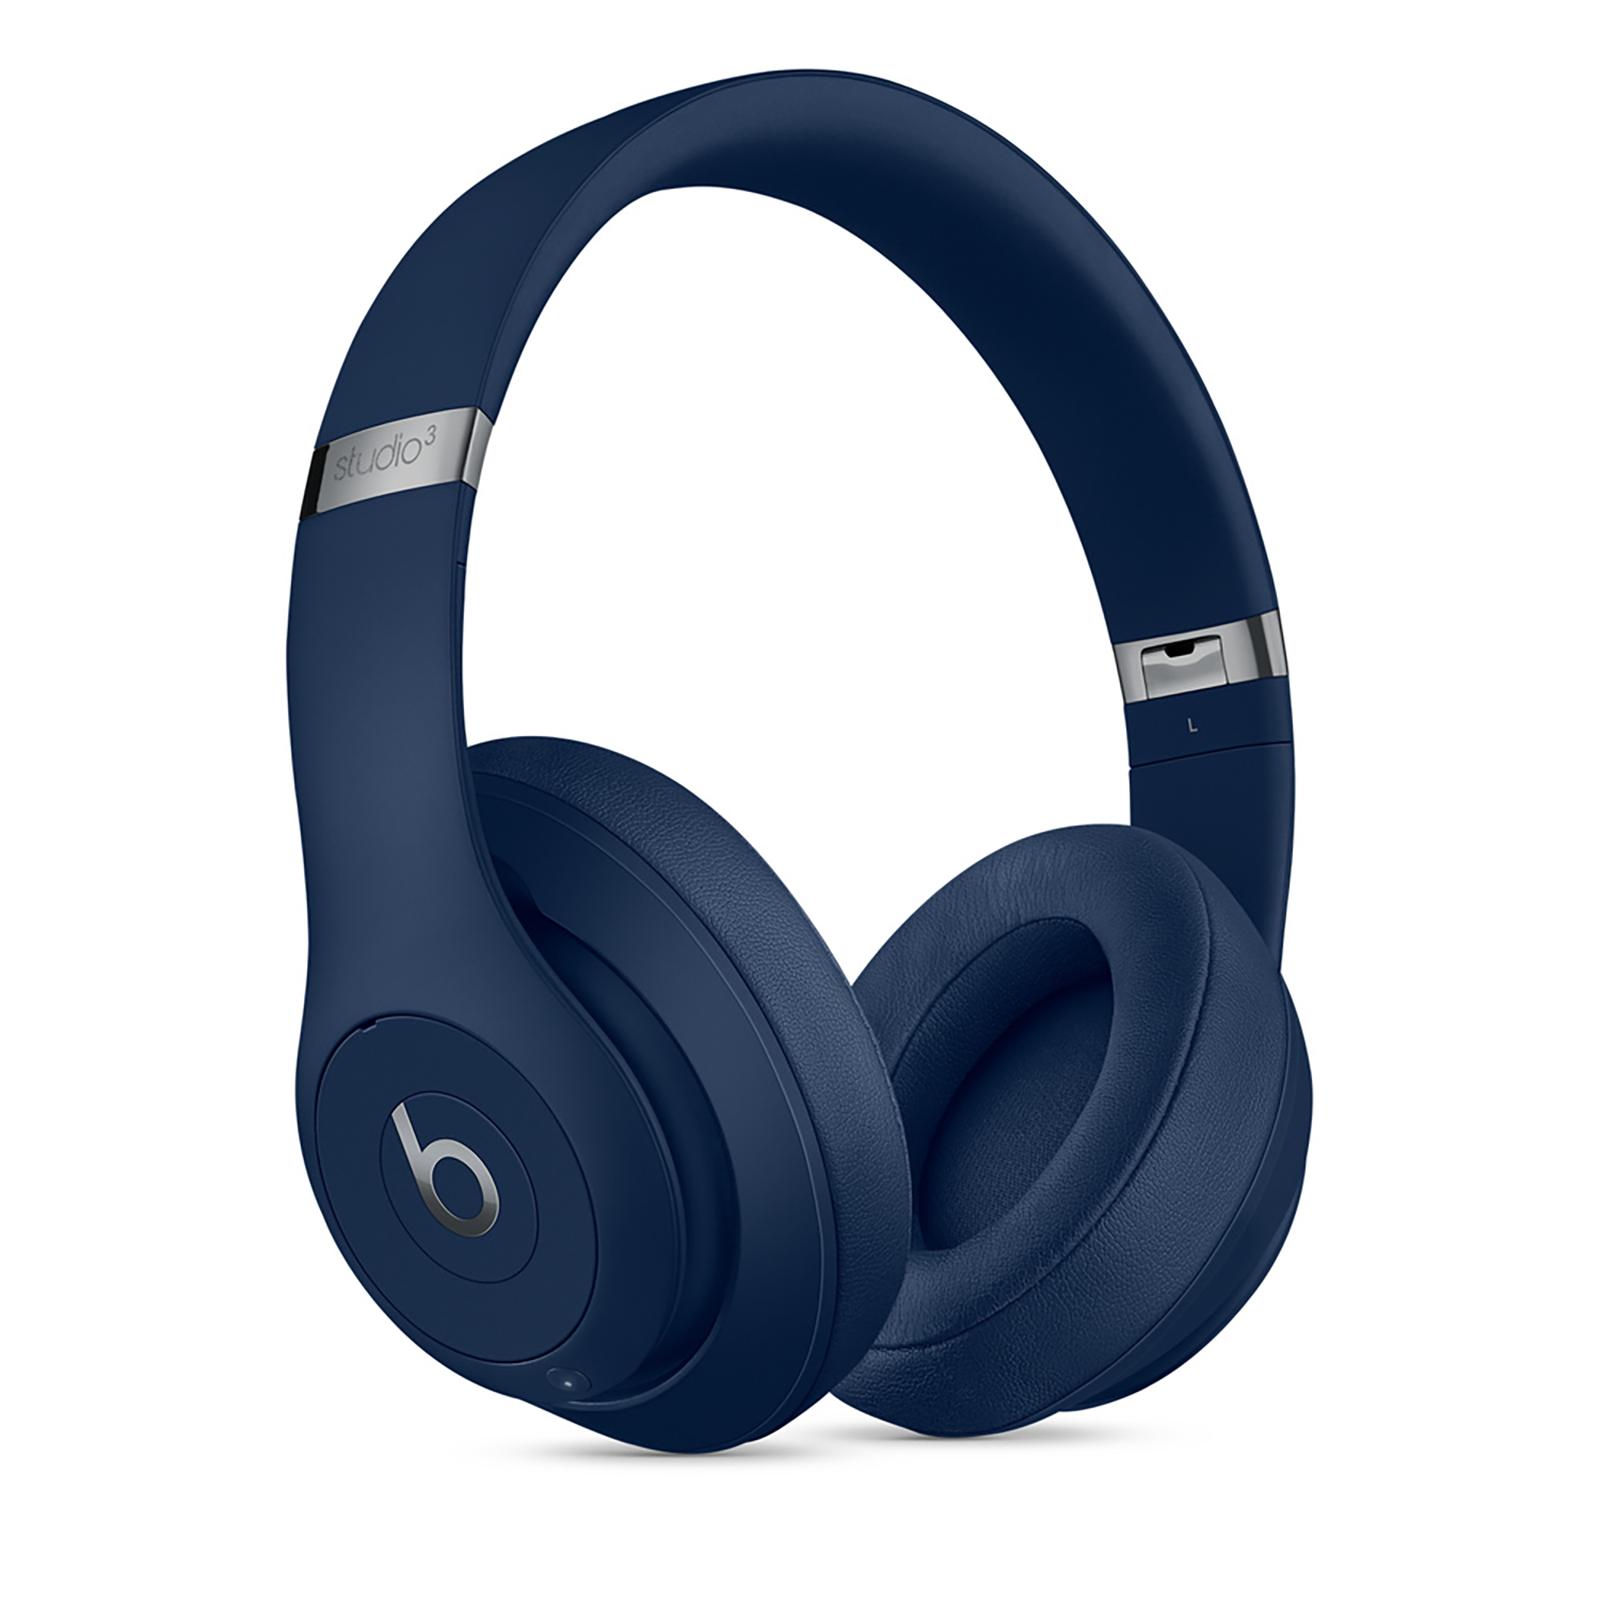 Beats Studio 3 Over-Ear Wireless Headphone with Mic (Bluetooth, MX402ZM/A, Blue)_1